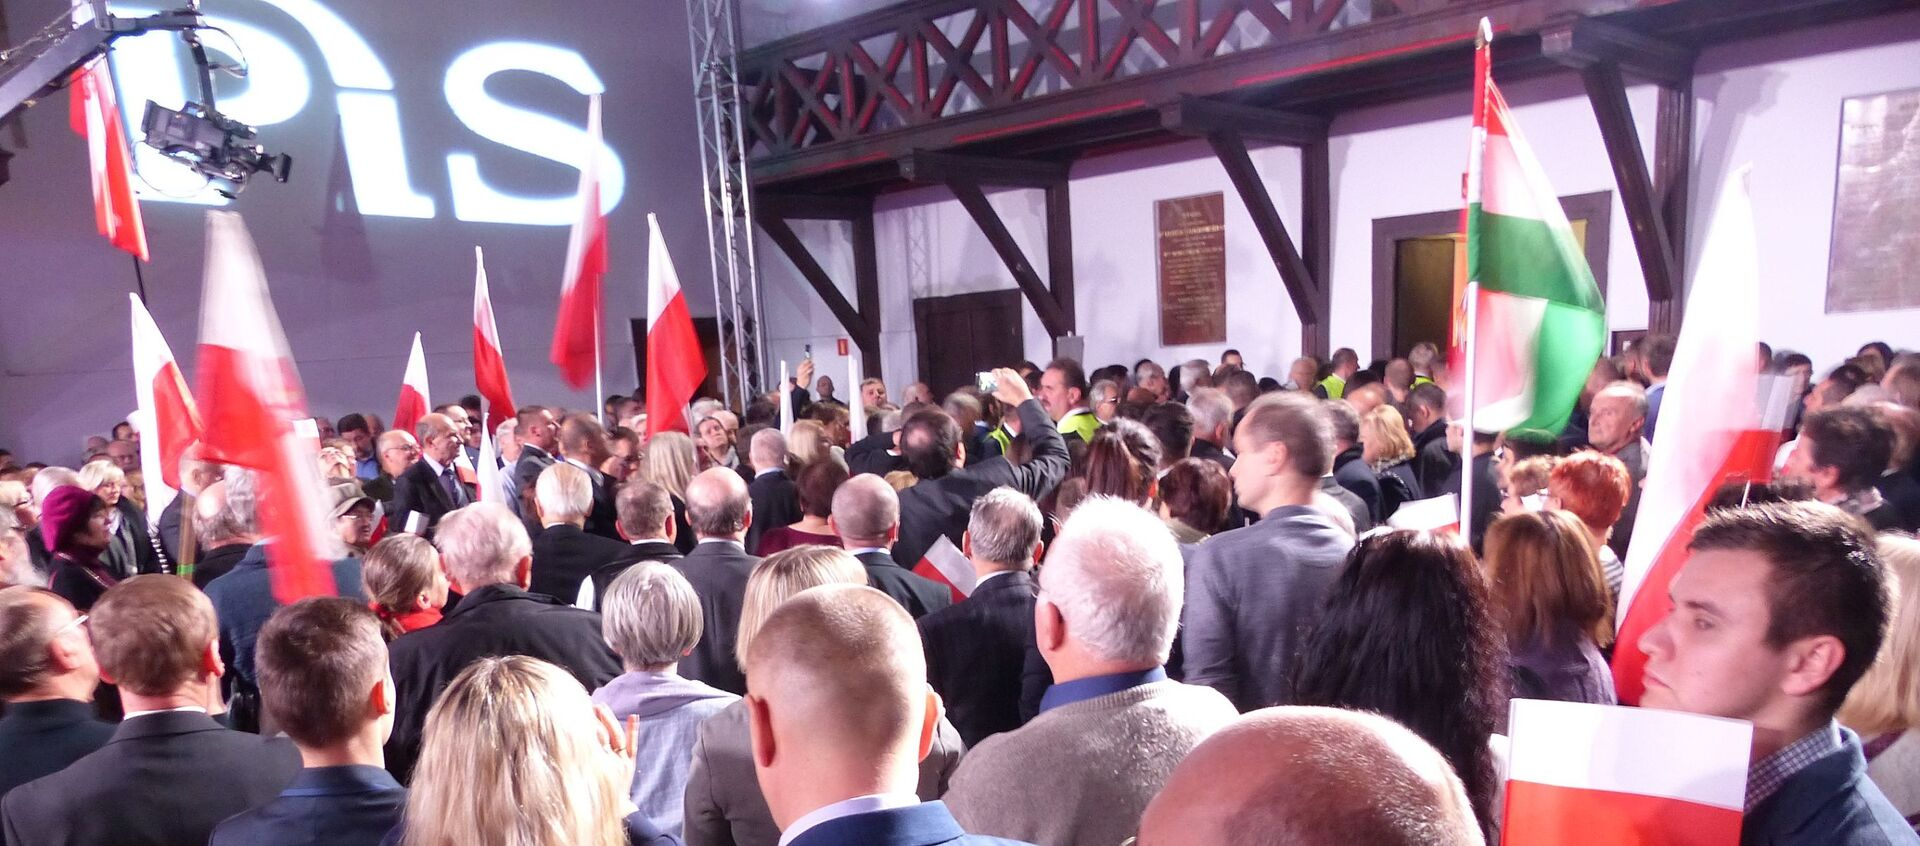 Zjazd partii PiS - Sputnik Polska, 1920, 26.05.2021